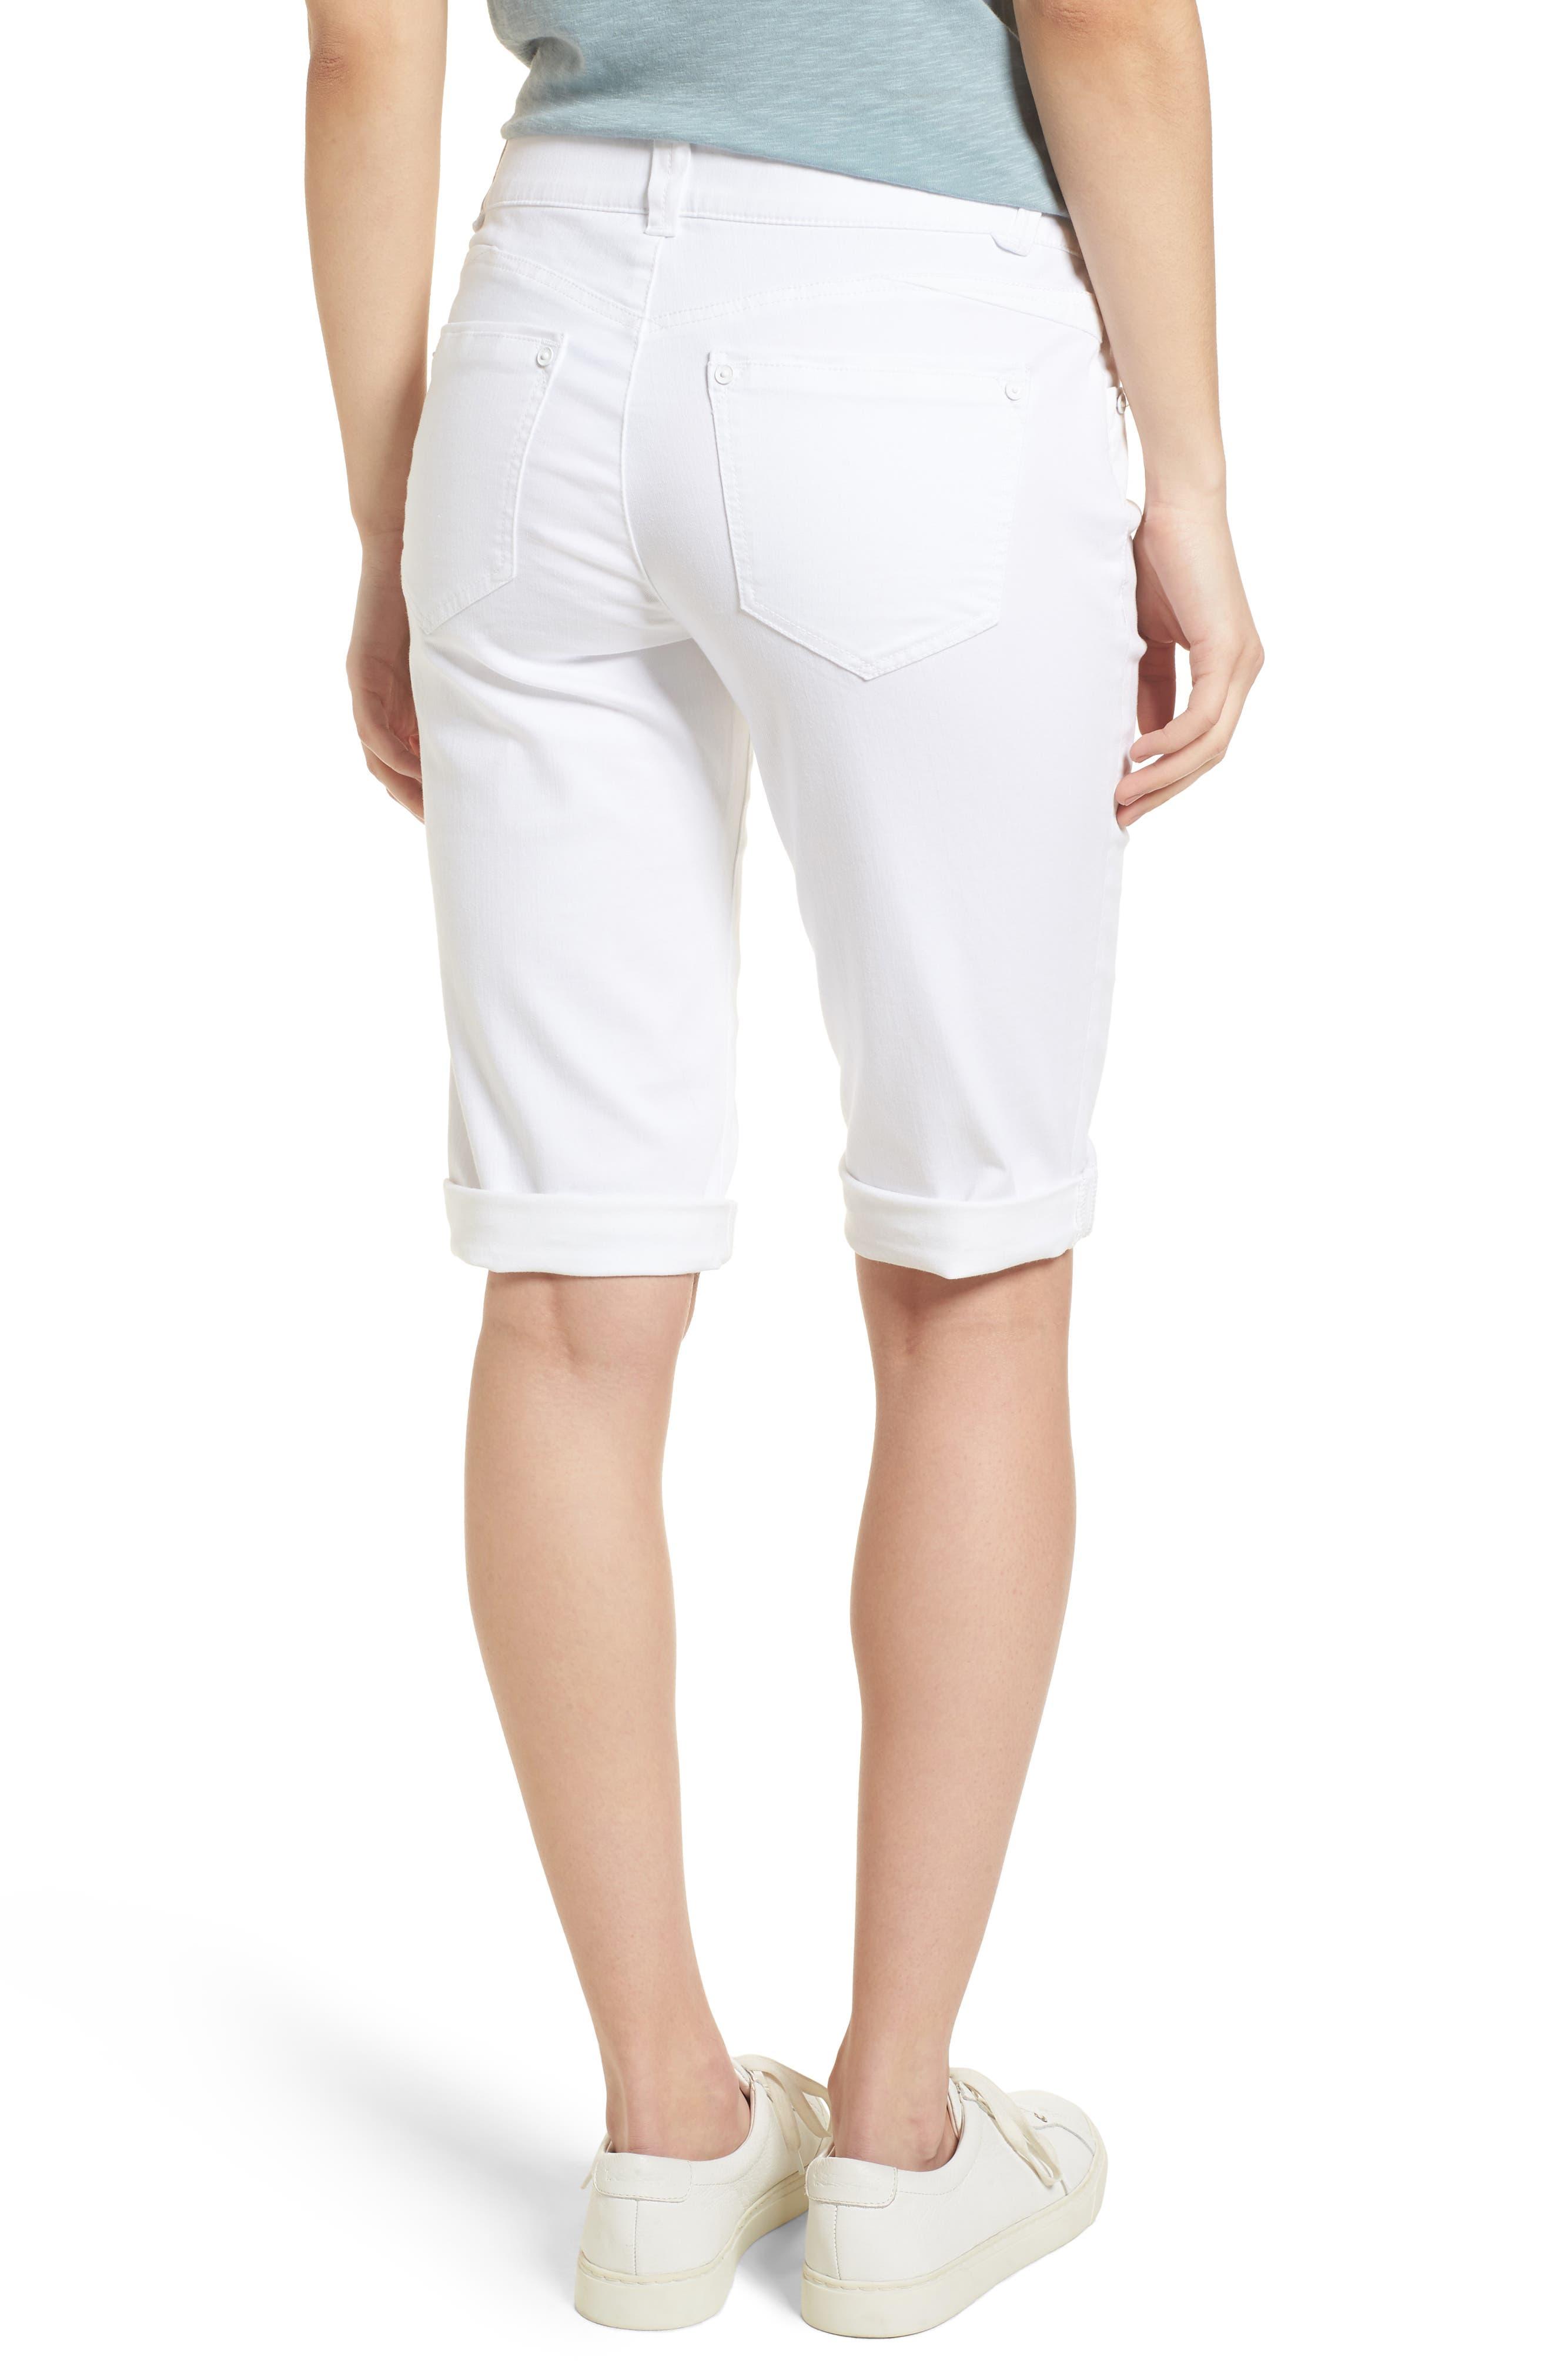 Ab-solution White Bermuda Shorts,                             Alternate thumbnail 2, color,                             OPTIC WHITE